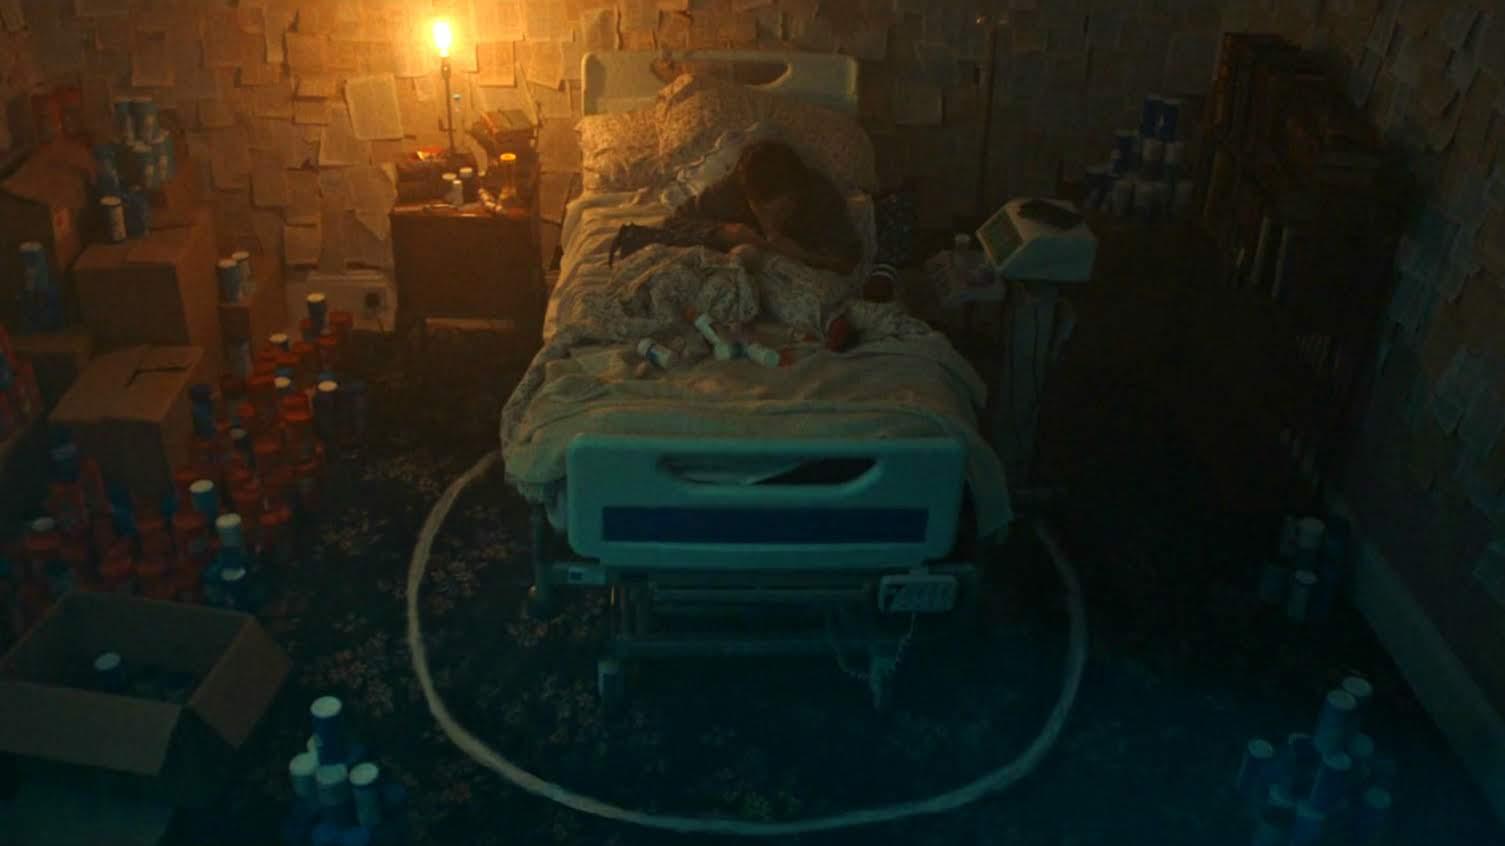 Salt : 魔除けの塩の輪で封じ込めろ ! !、病んだ娘を守る母の決死の行動を、わずか約2分の電光石火で描いたショート・ホラーの傑作「ソルト」を観逃がさないで下さい ! !